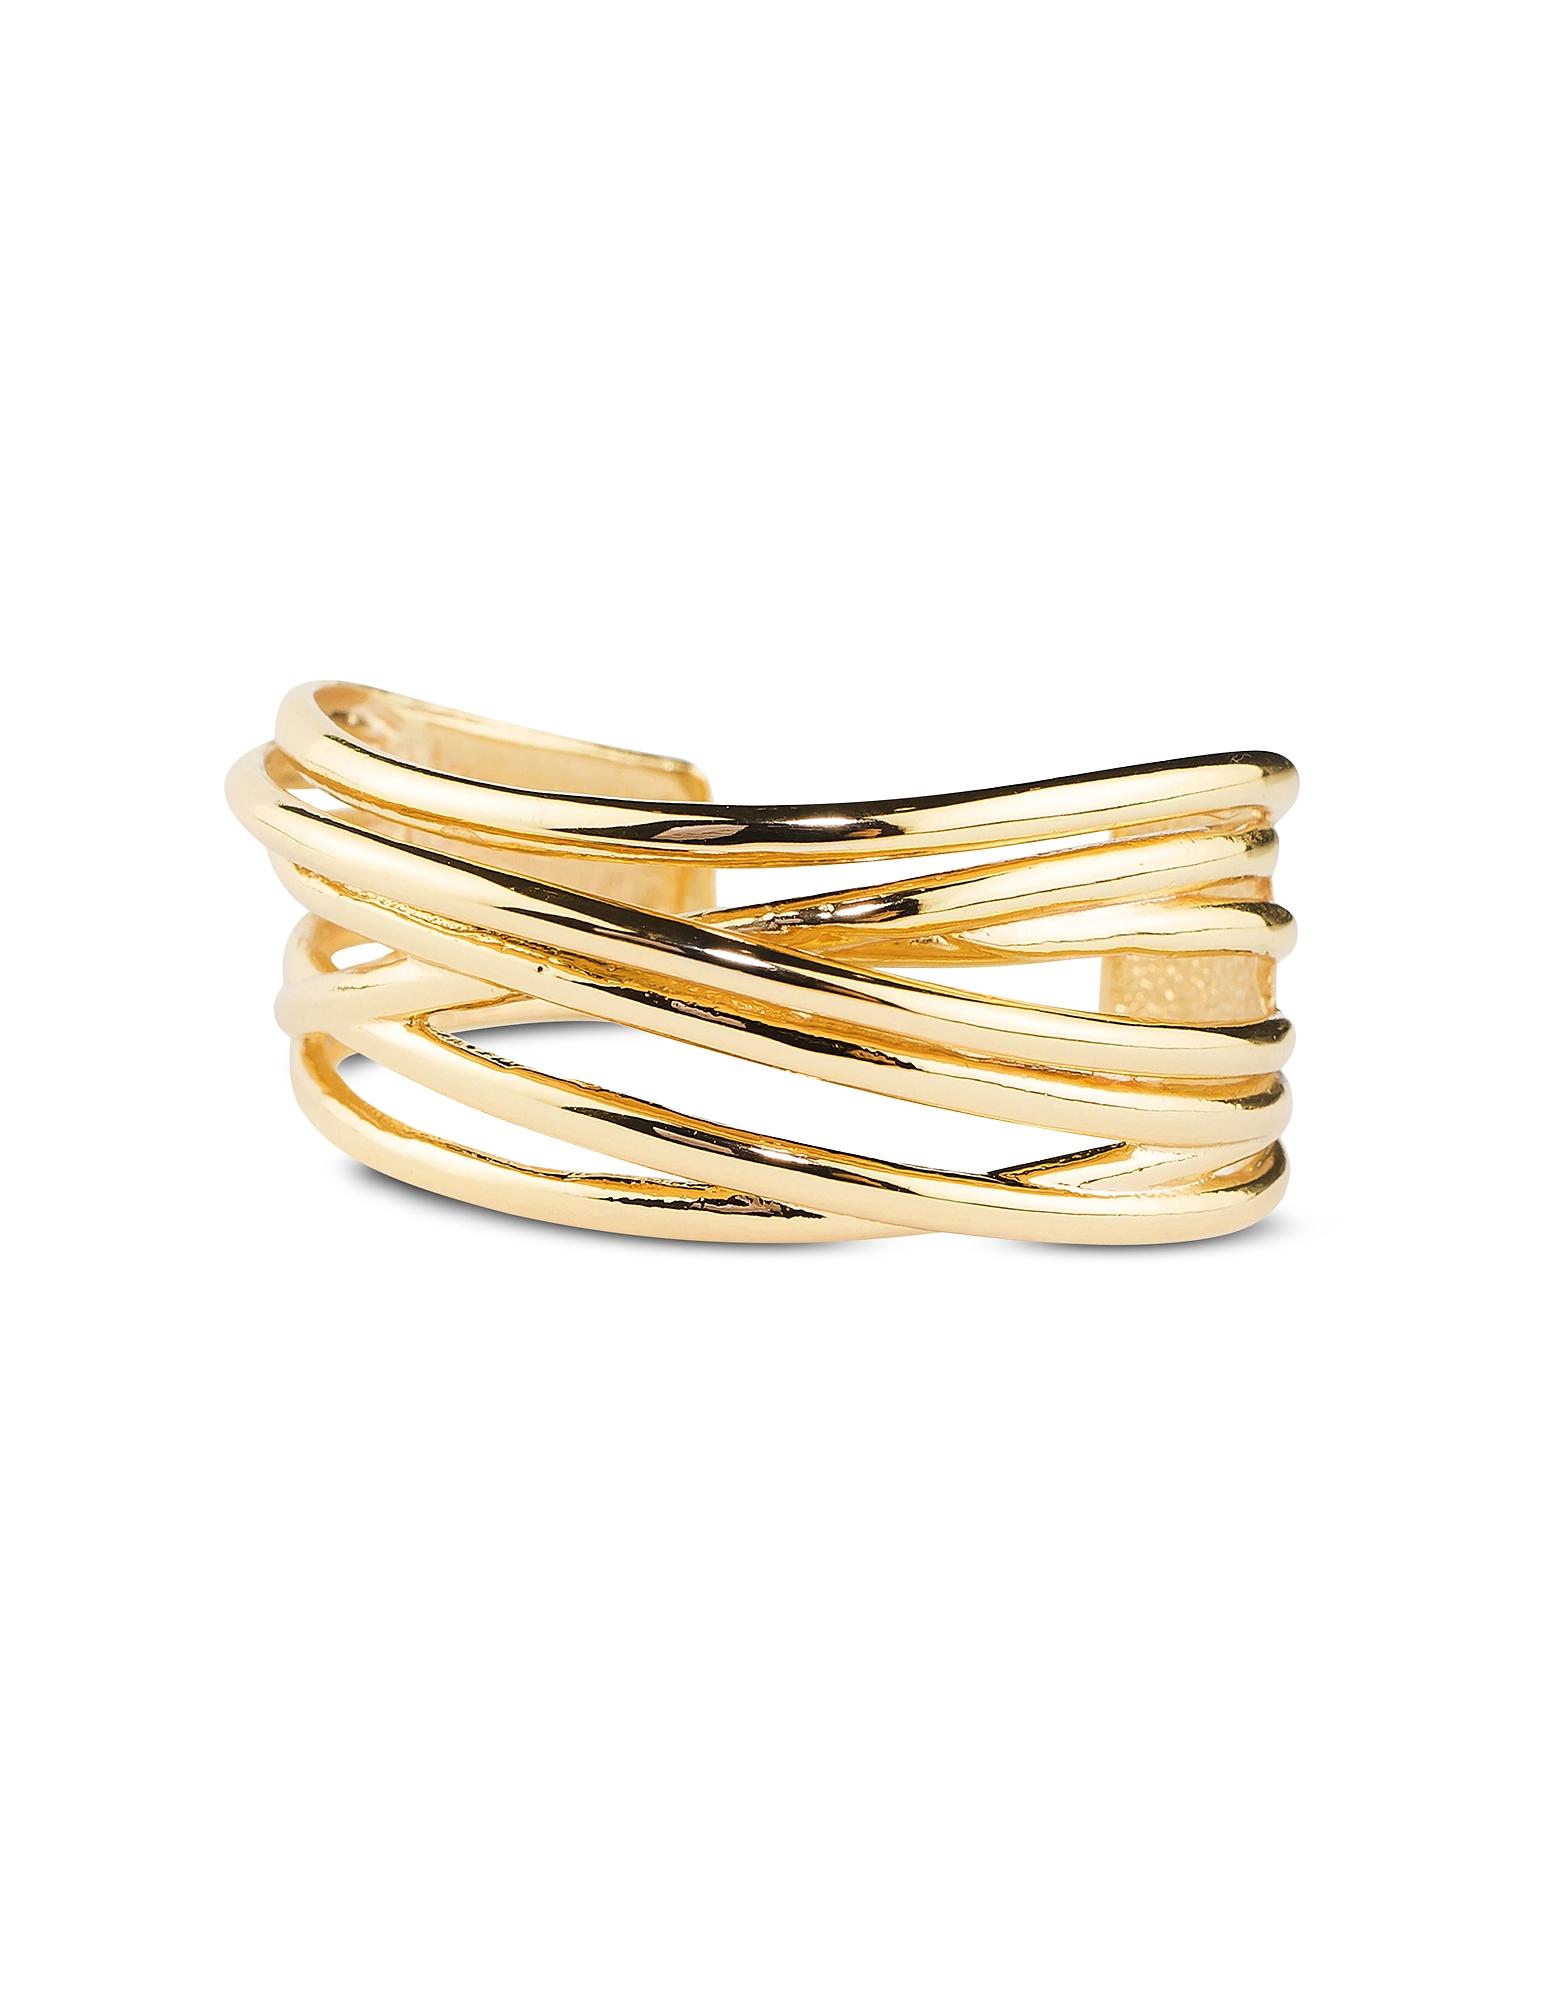 Federica Tosi Bracelets, Small Stick Bangle